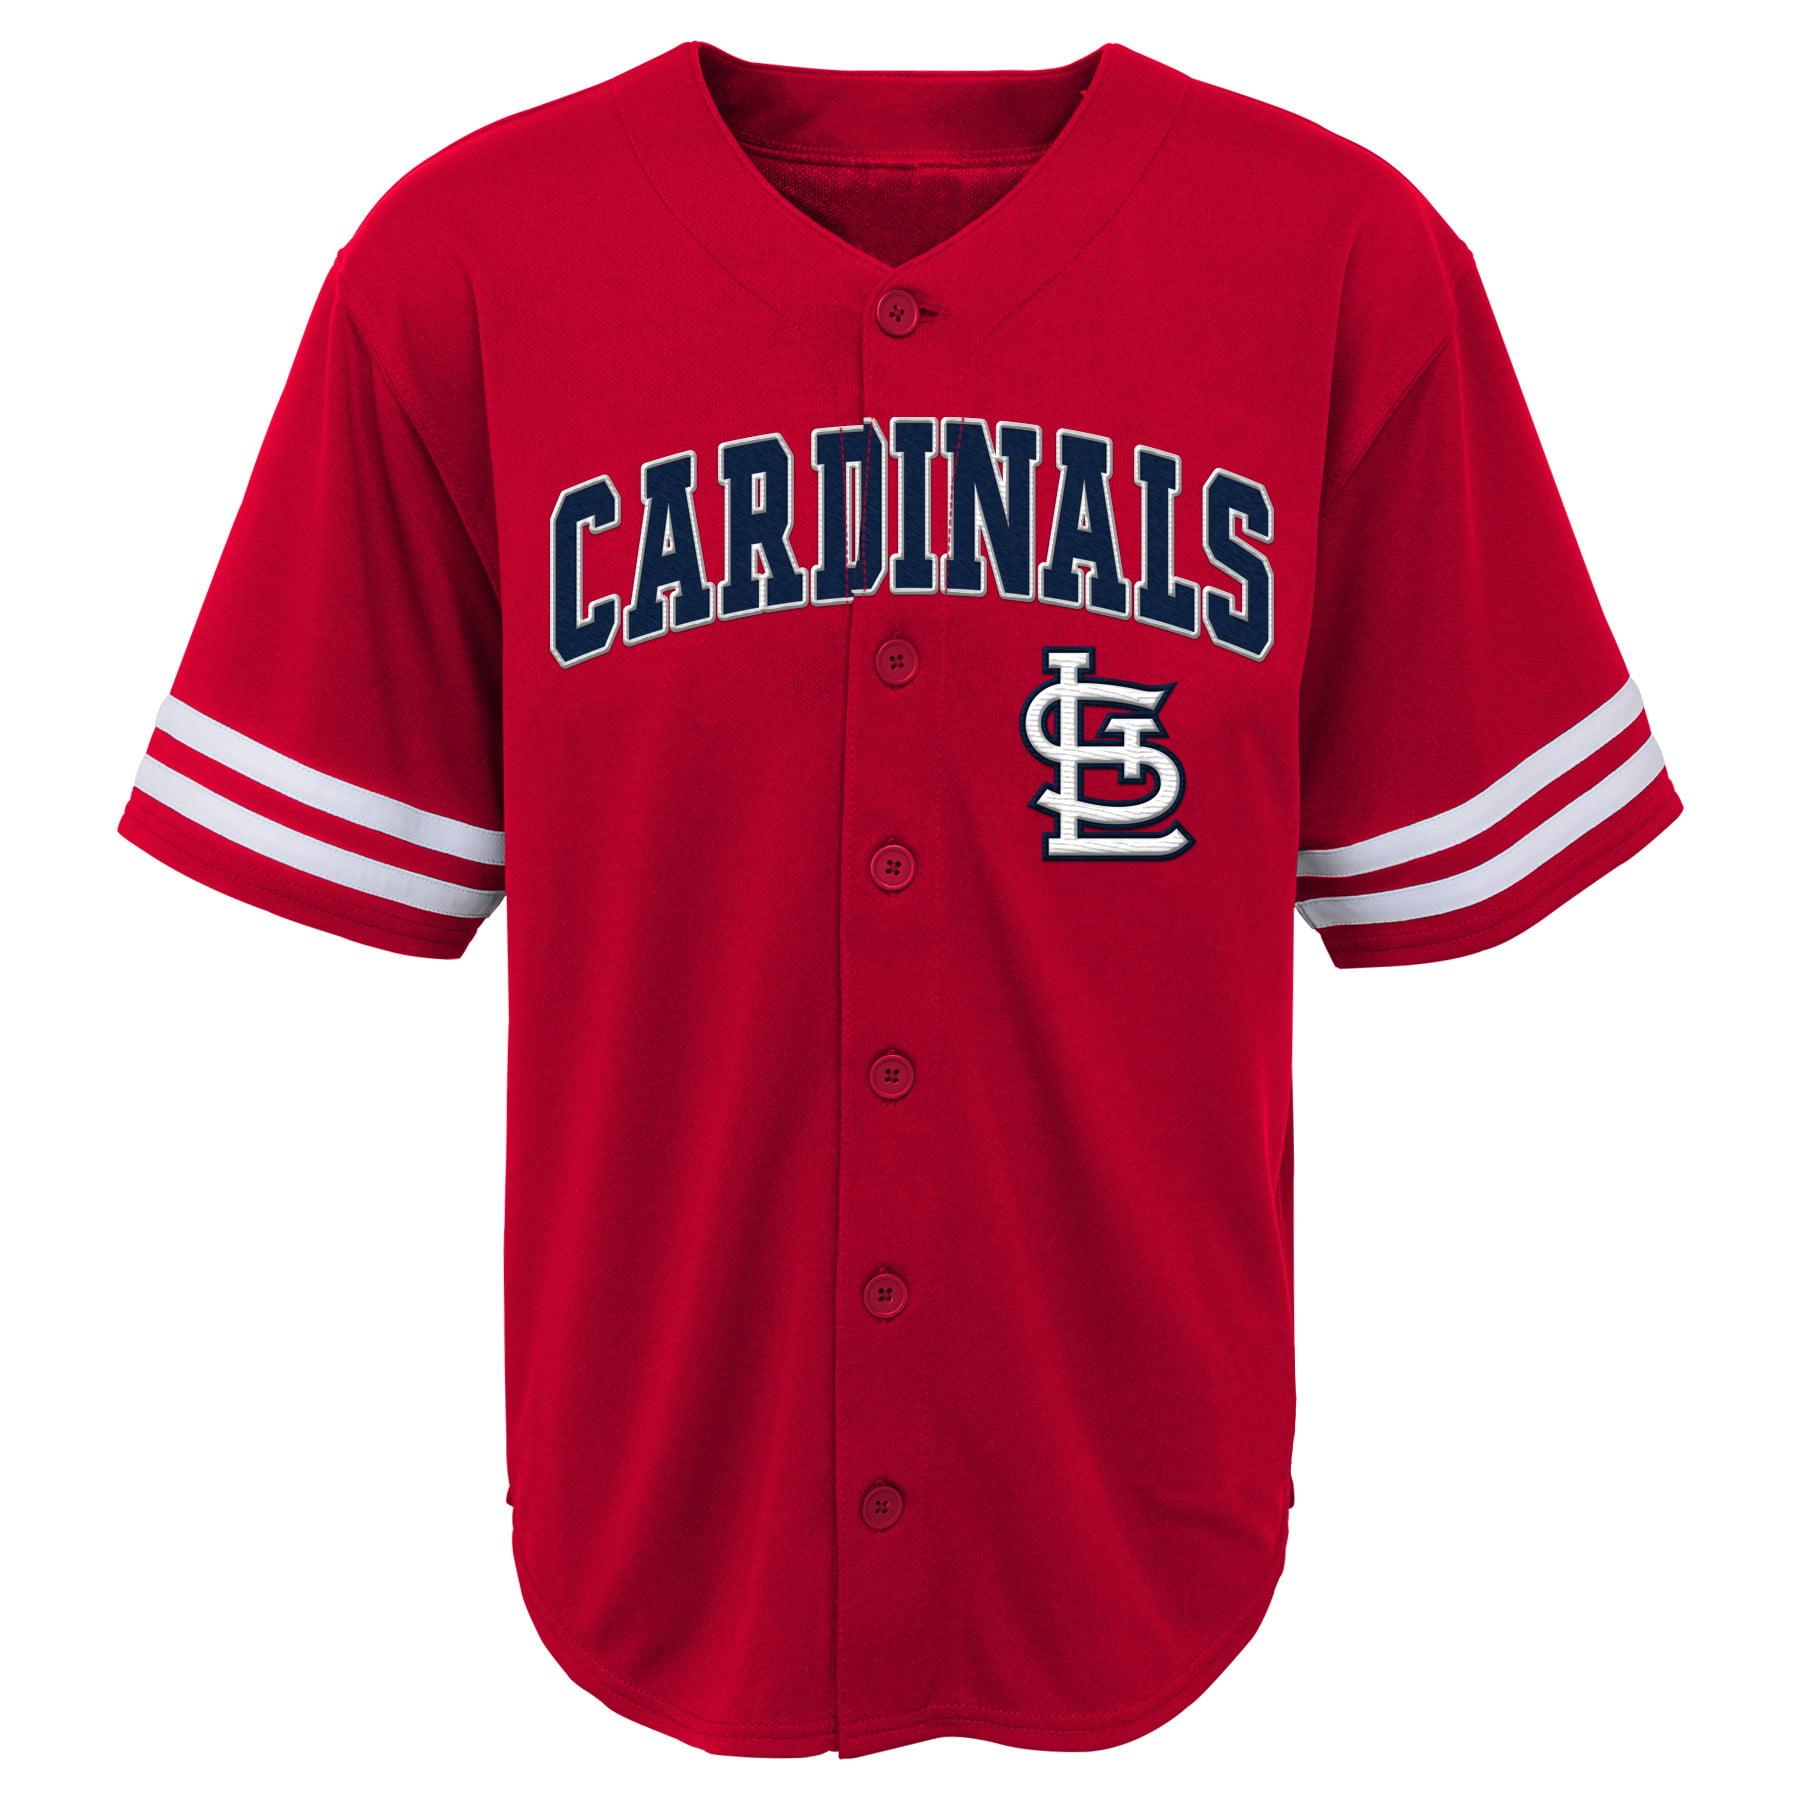 MLB St Louis CARDINALS TEE Short Sleeve Boys Fashion Jersey Tee 60% Cotton 40% Polyester BLACK Team Tee 4-18